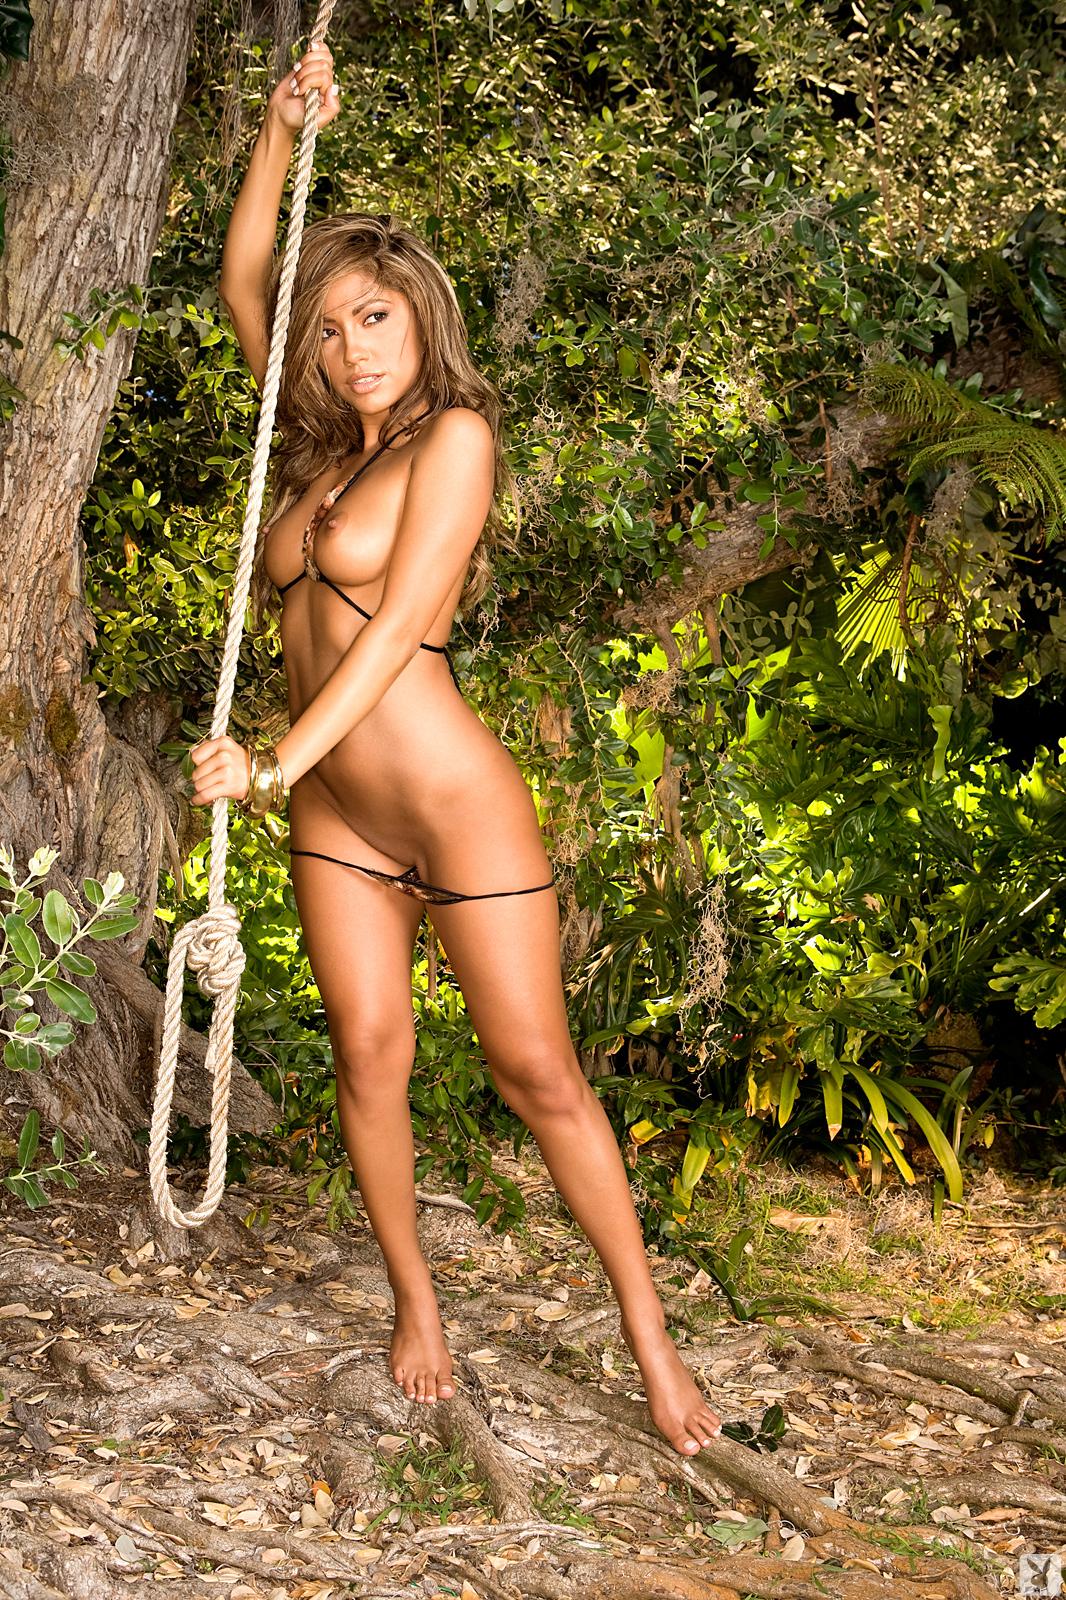 Jessica burciaga nude situation